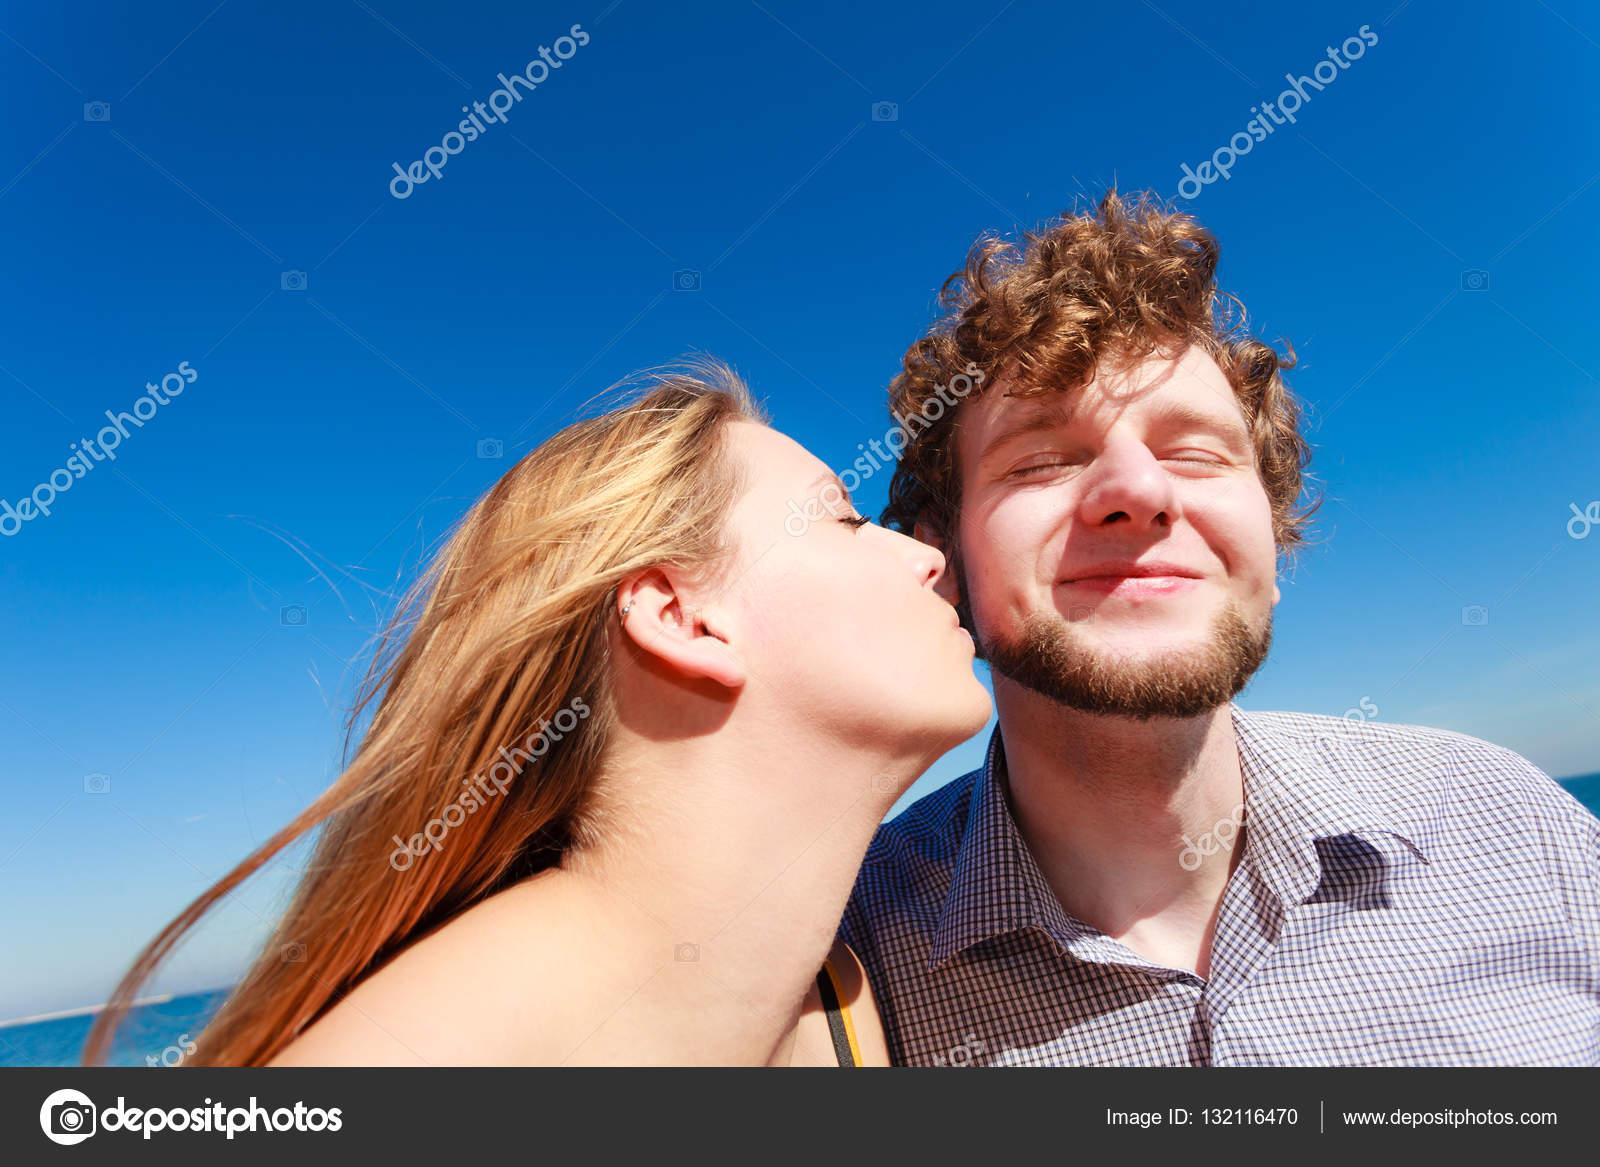 Любовь знакомства поцелуй знакомства ищу спонсора москва